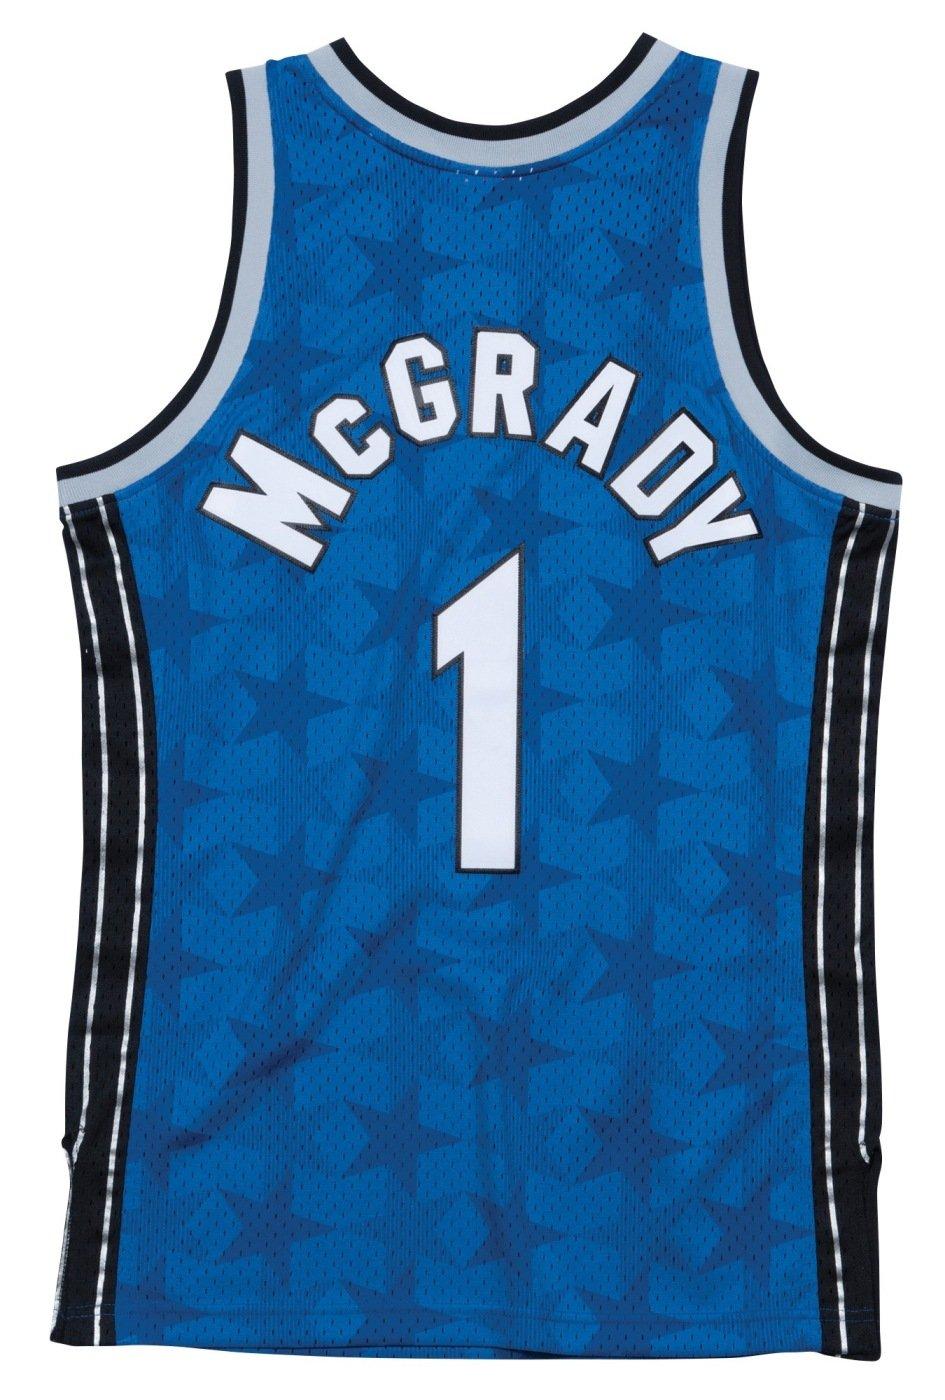 0257b84d26a Amazon.com: Mitchell & Ness Men's Orlando Magic Tracy McGrady Swingman  Jersey: Clothing